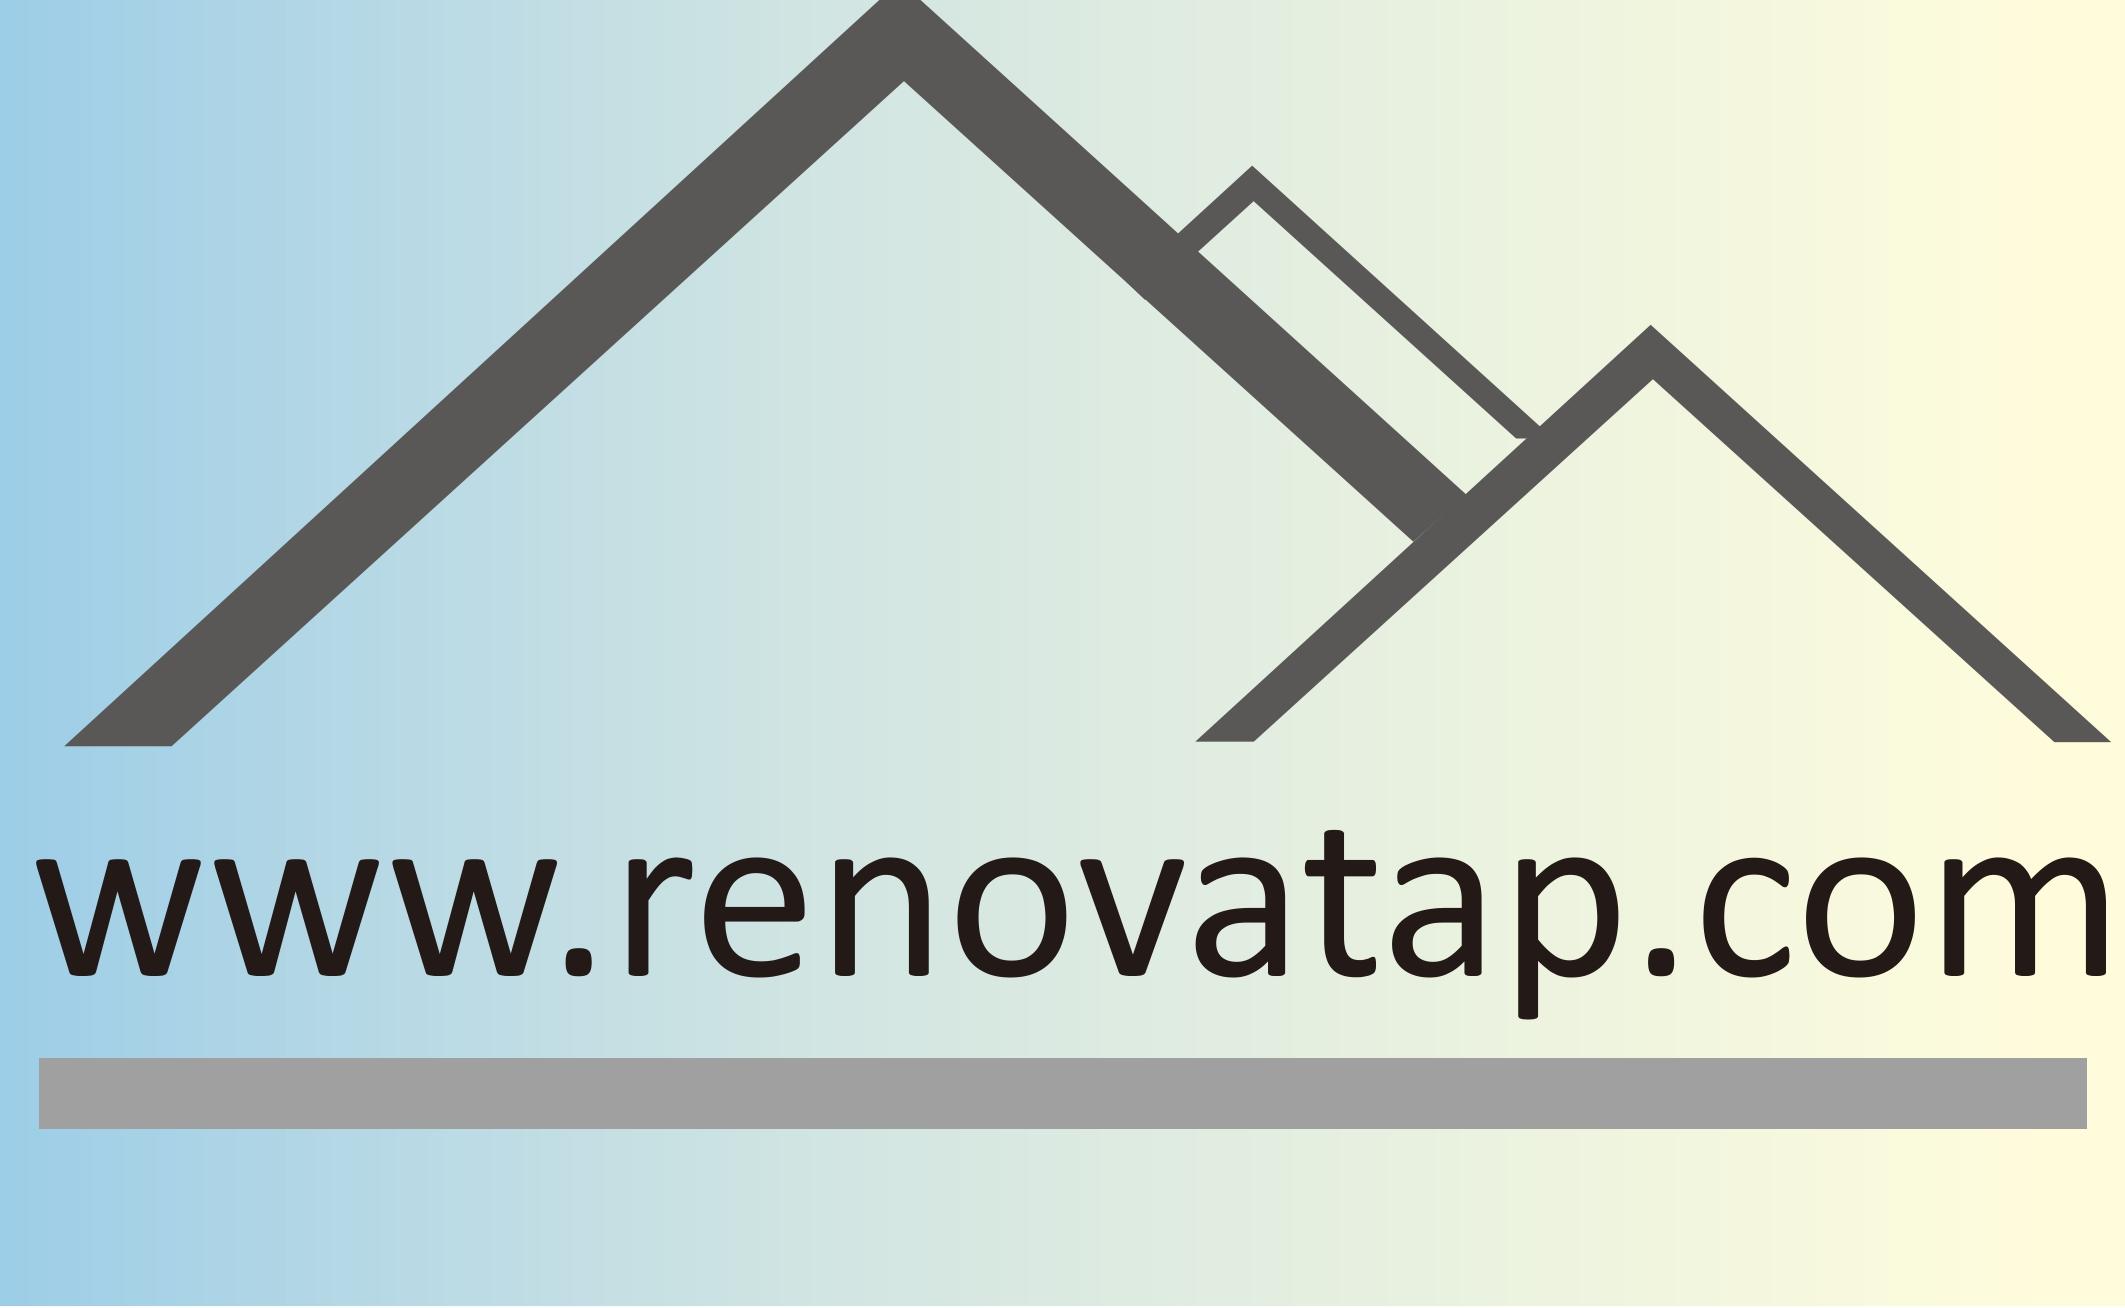 renovatap.com